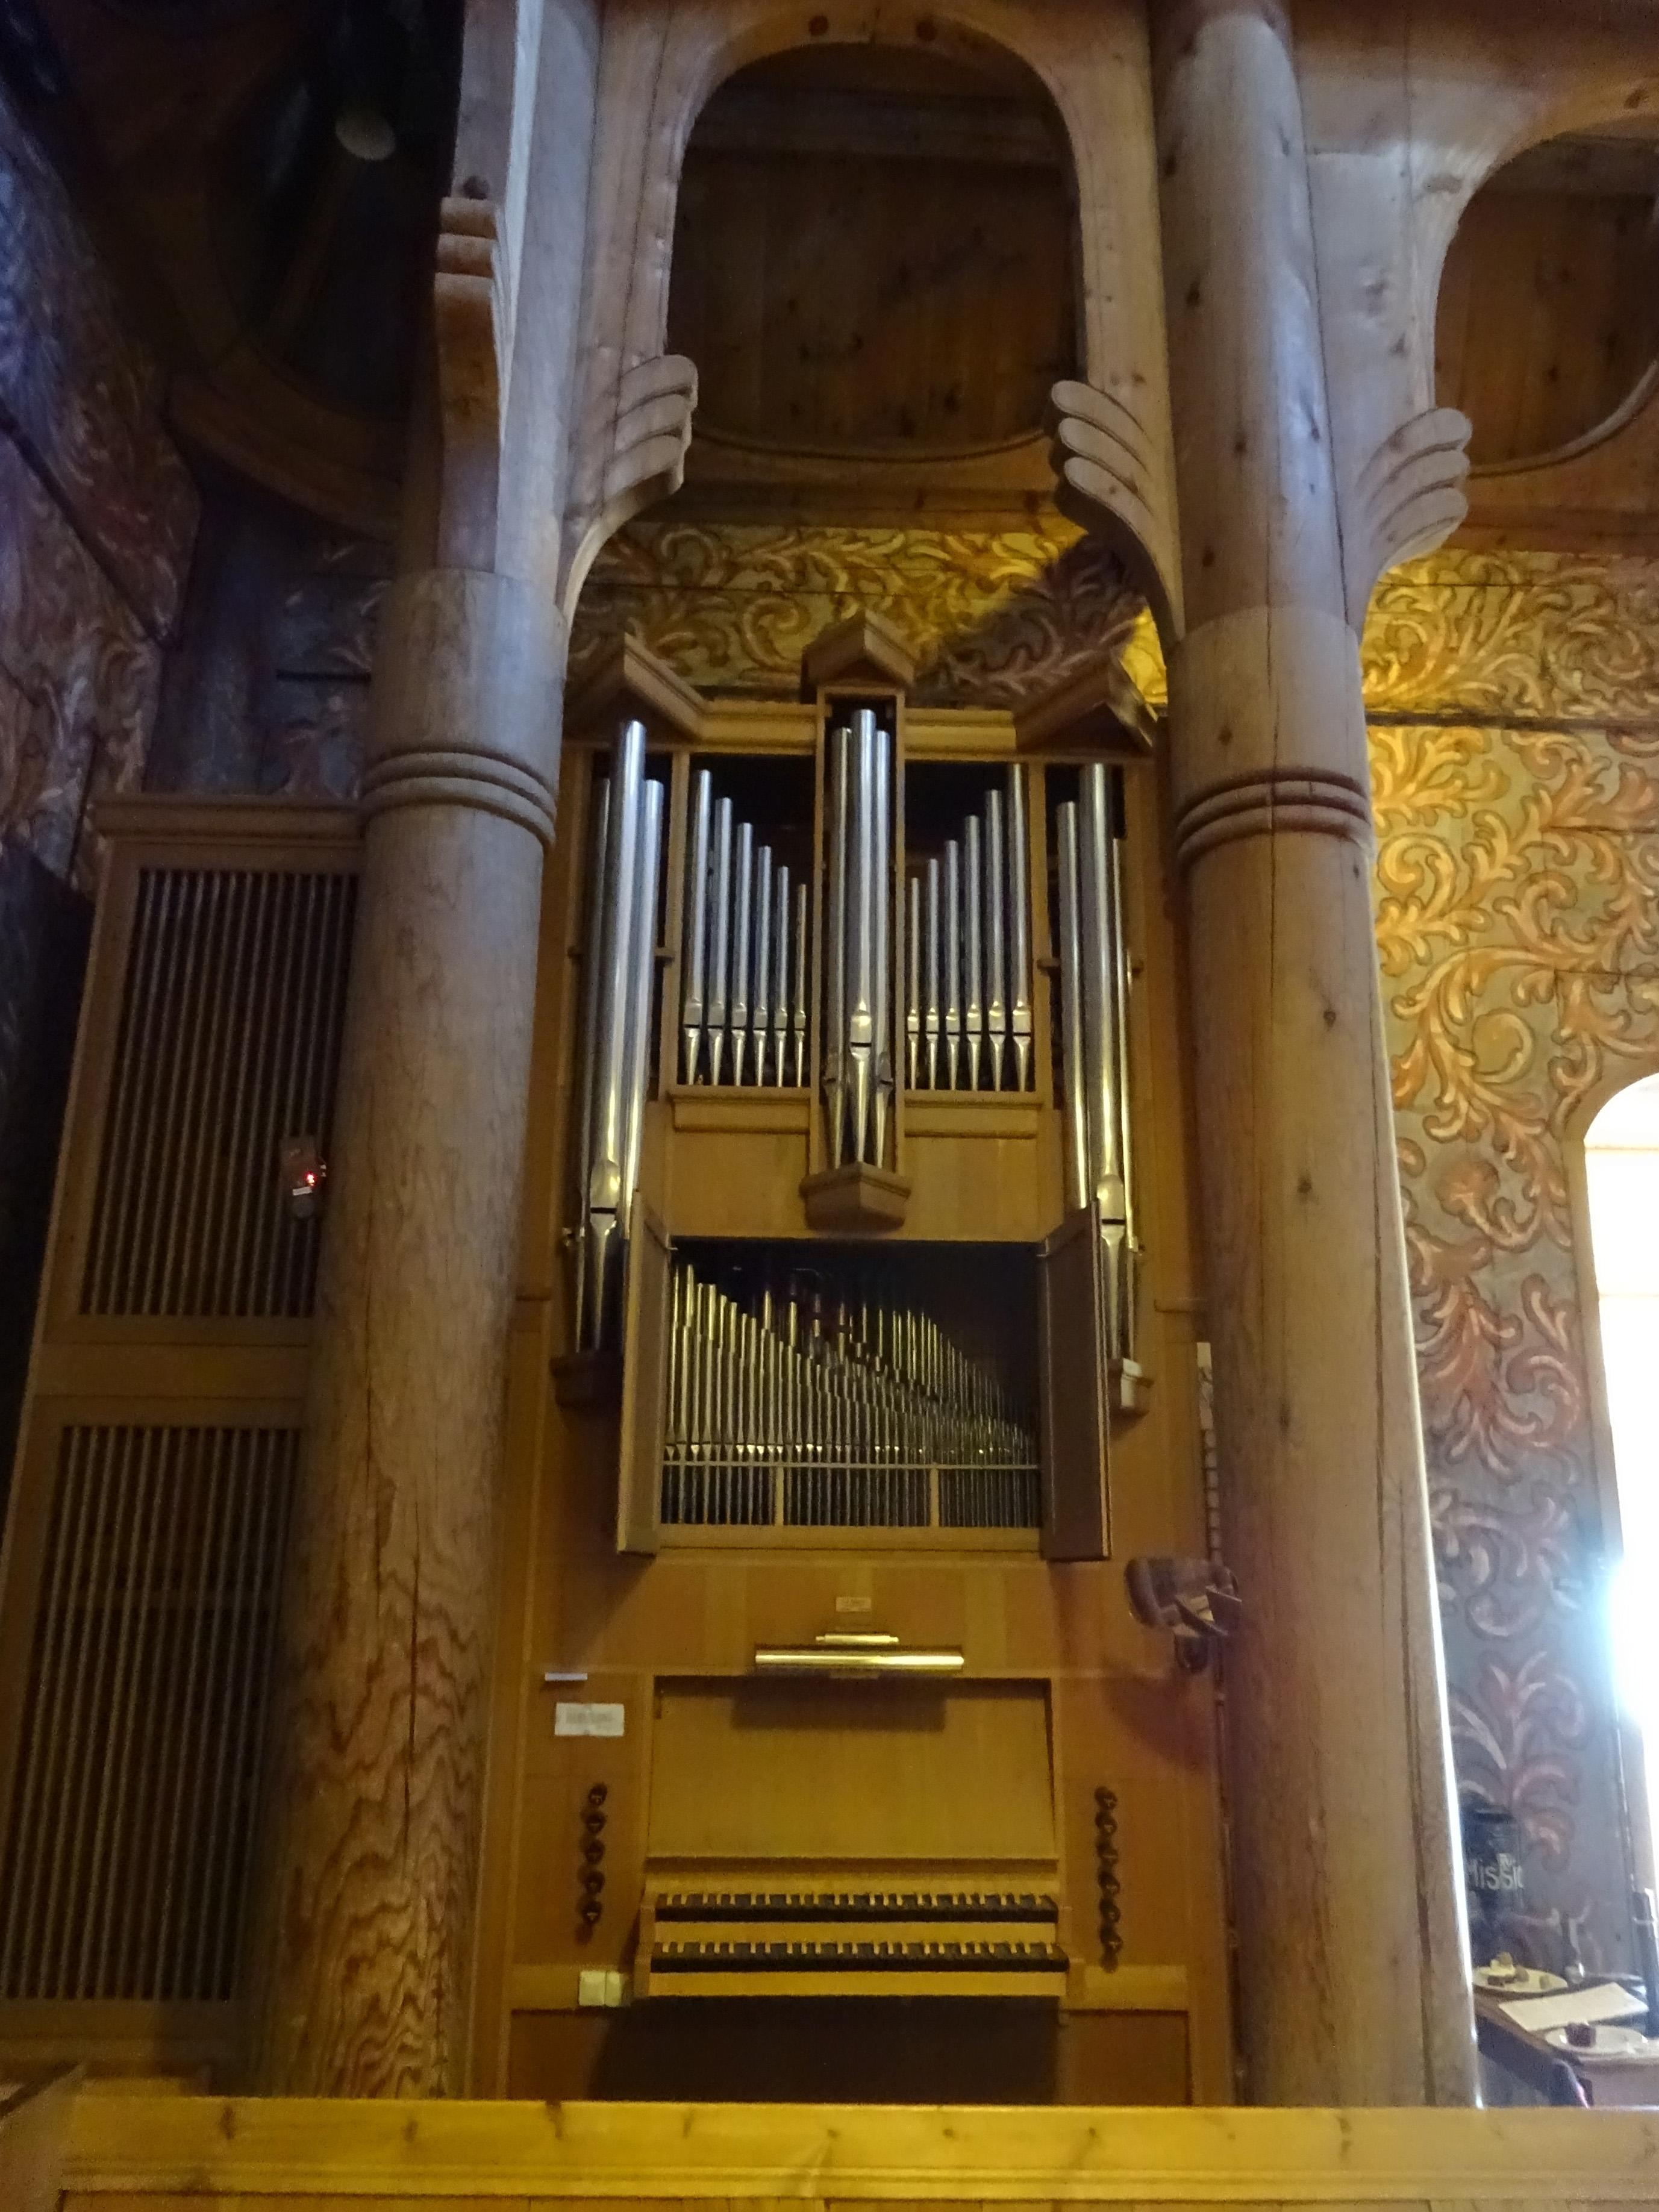 blog_d13s02_heddal_stave_church_017.jpg